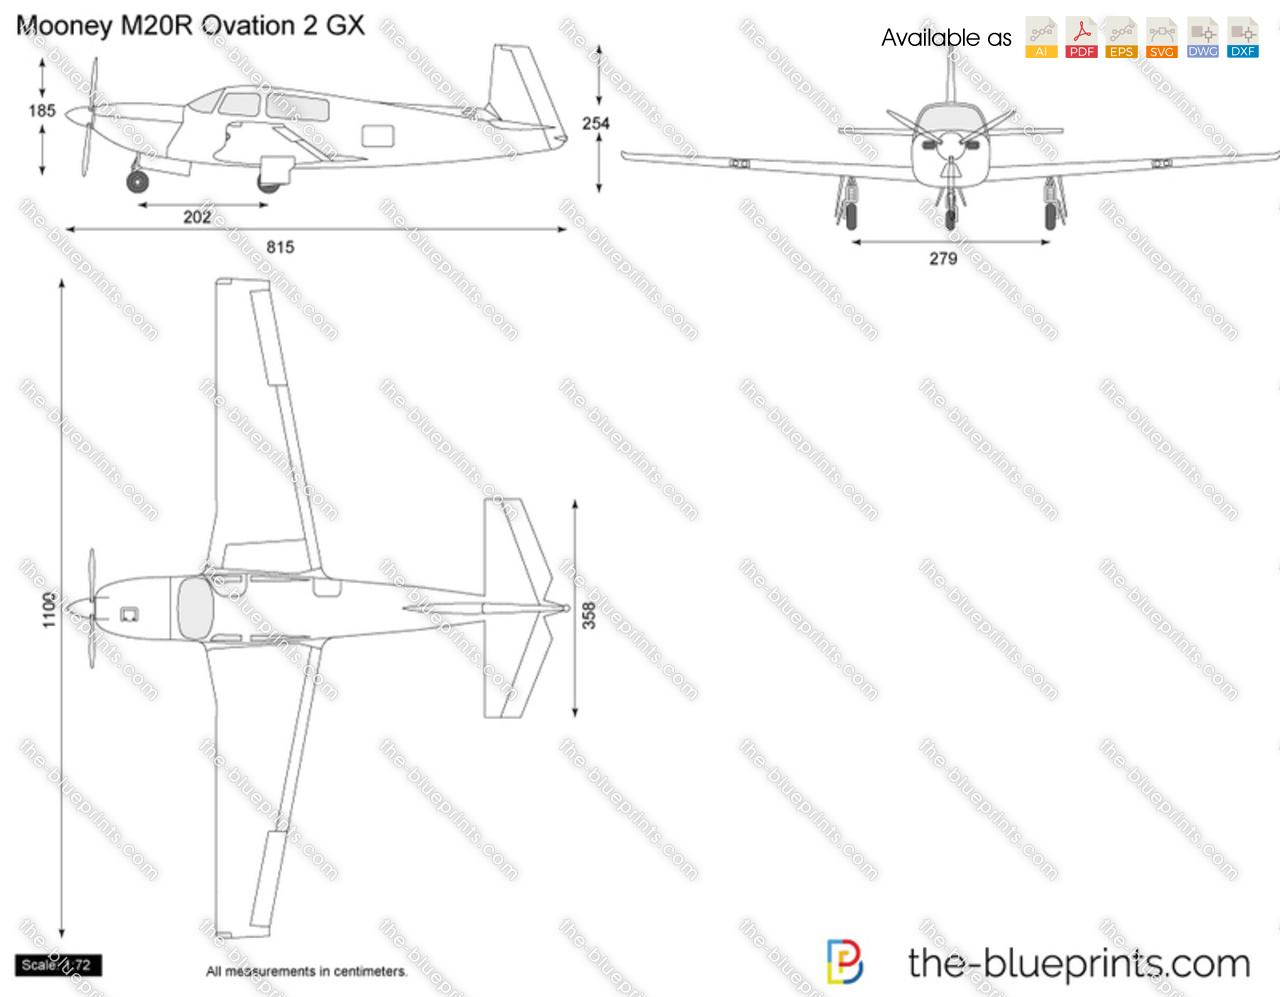 Mooney M20R Ovation 2 GX